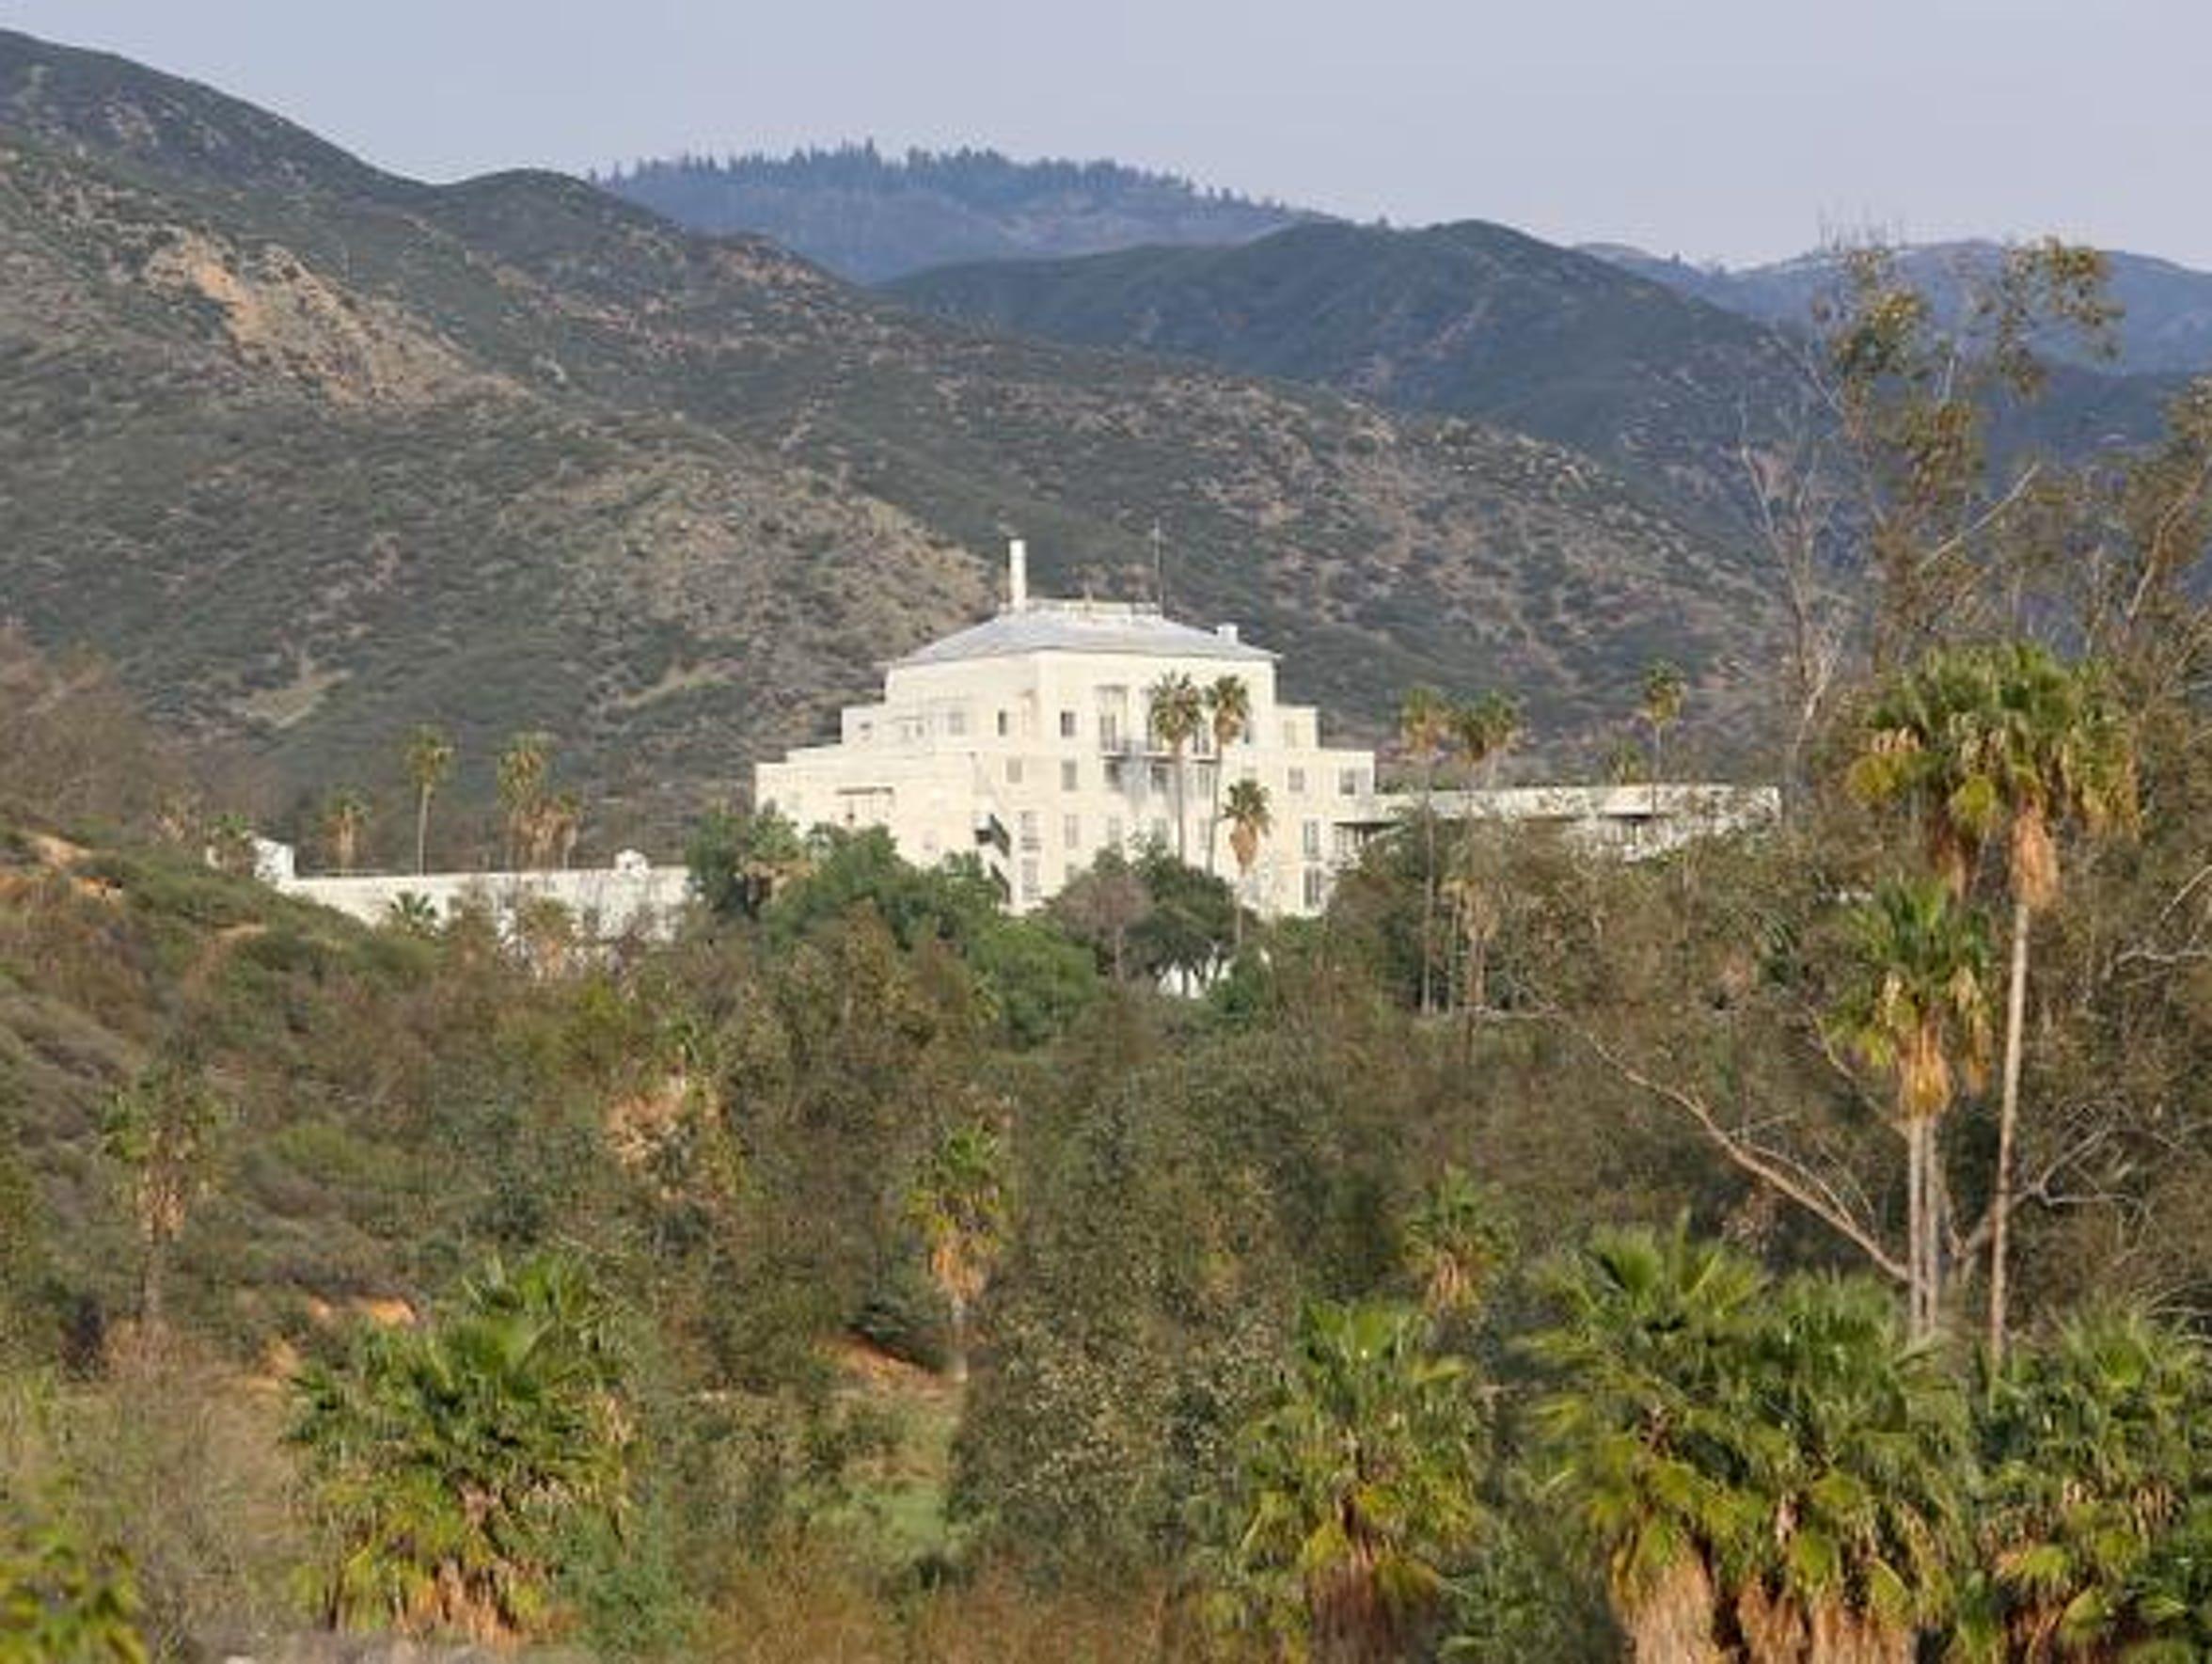 The historic Arrowhead Hot Springs Hotel near San Bernadino.